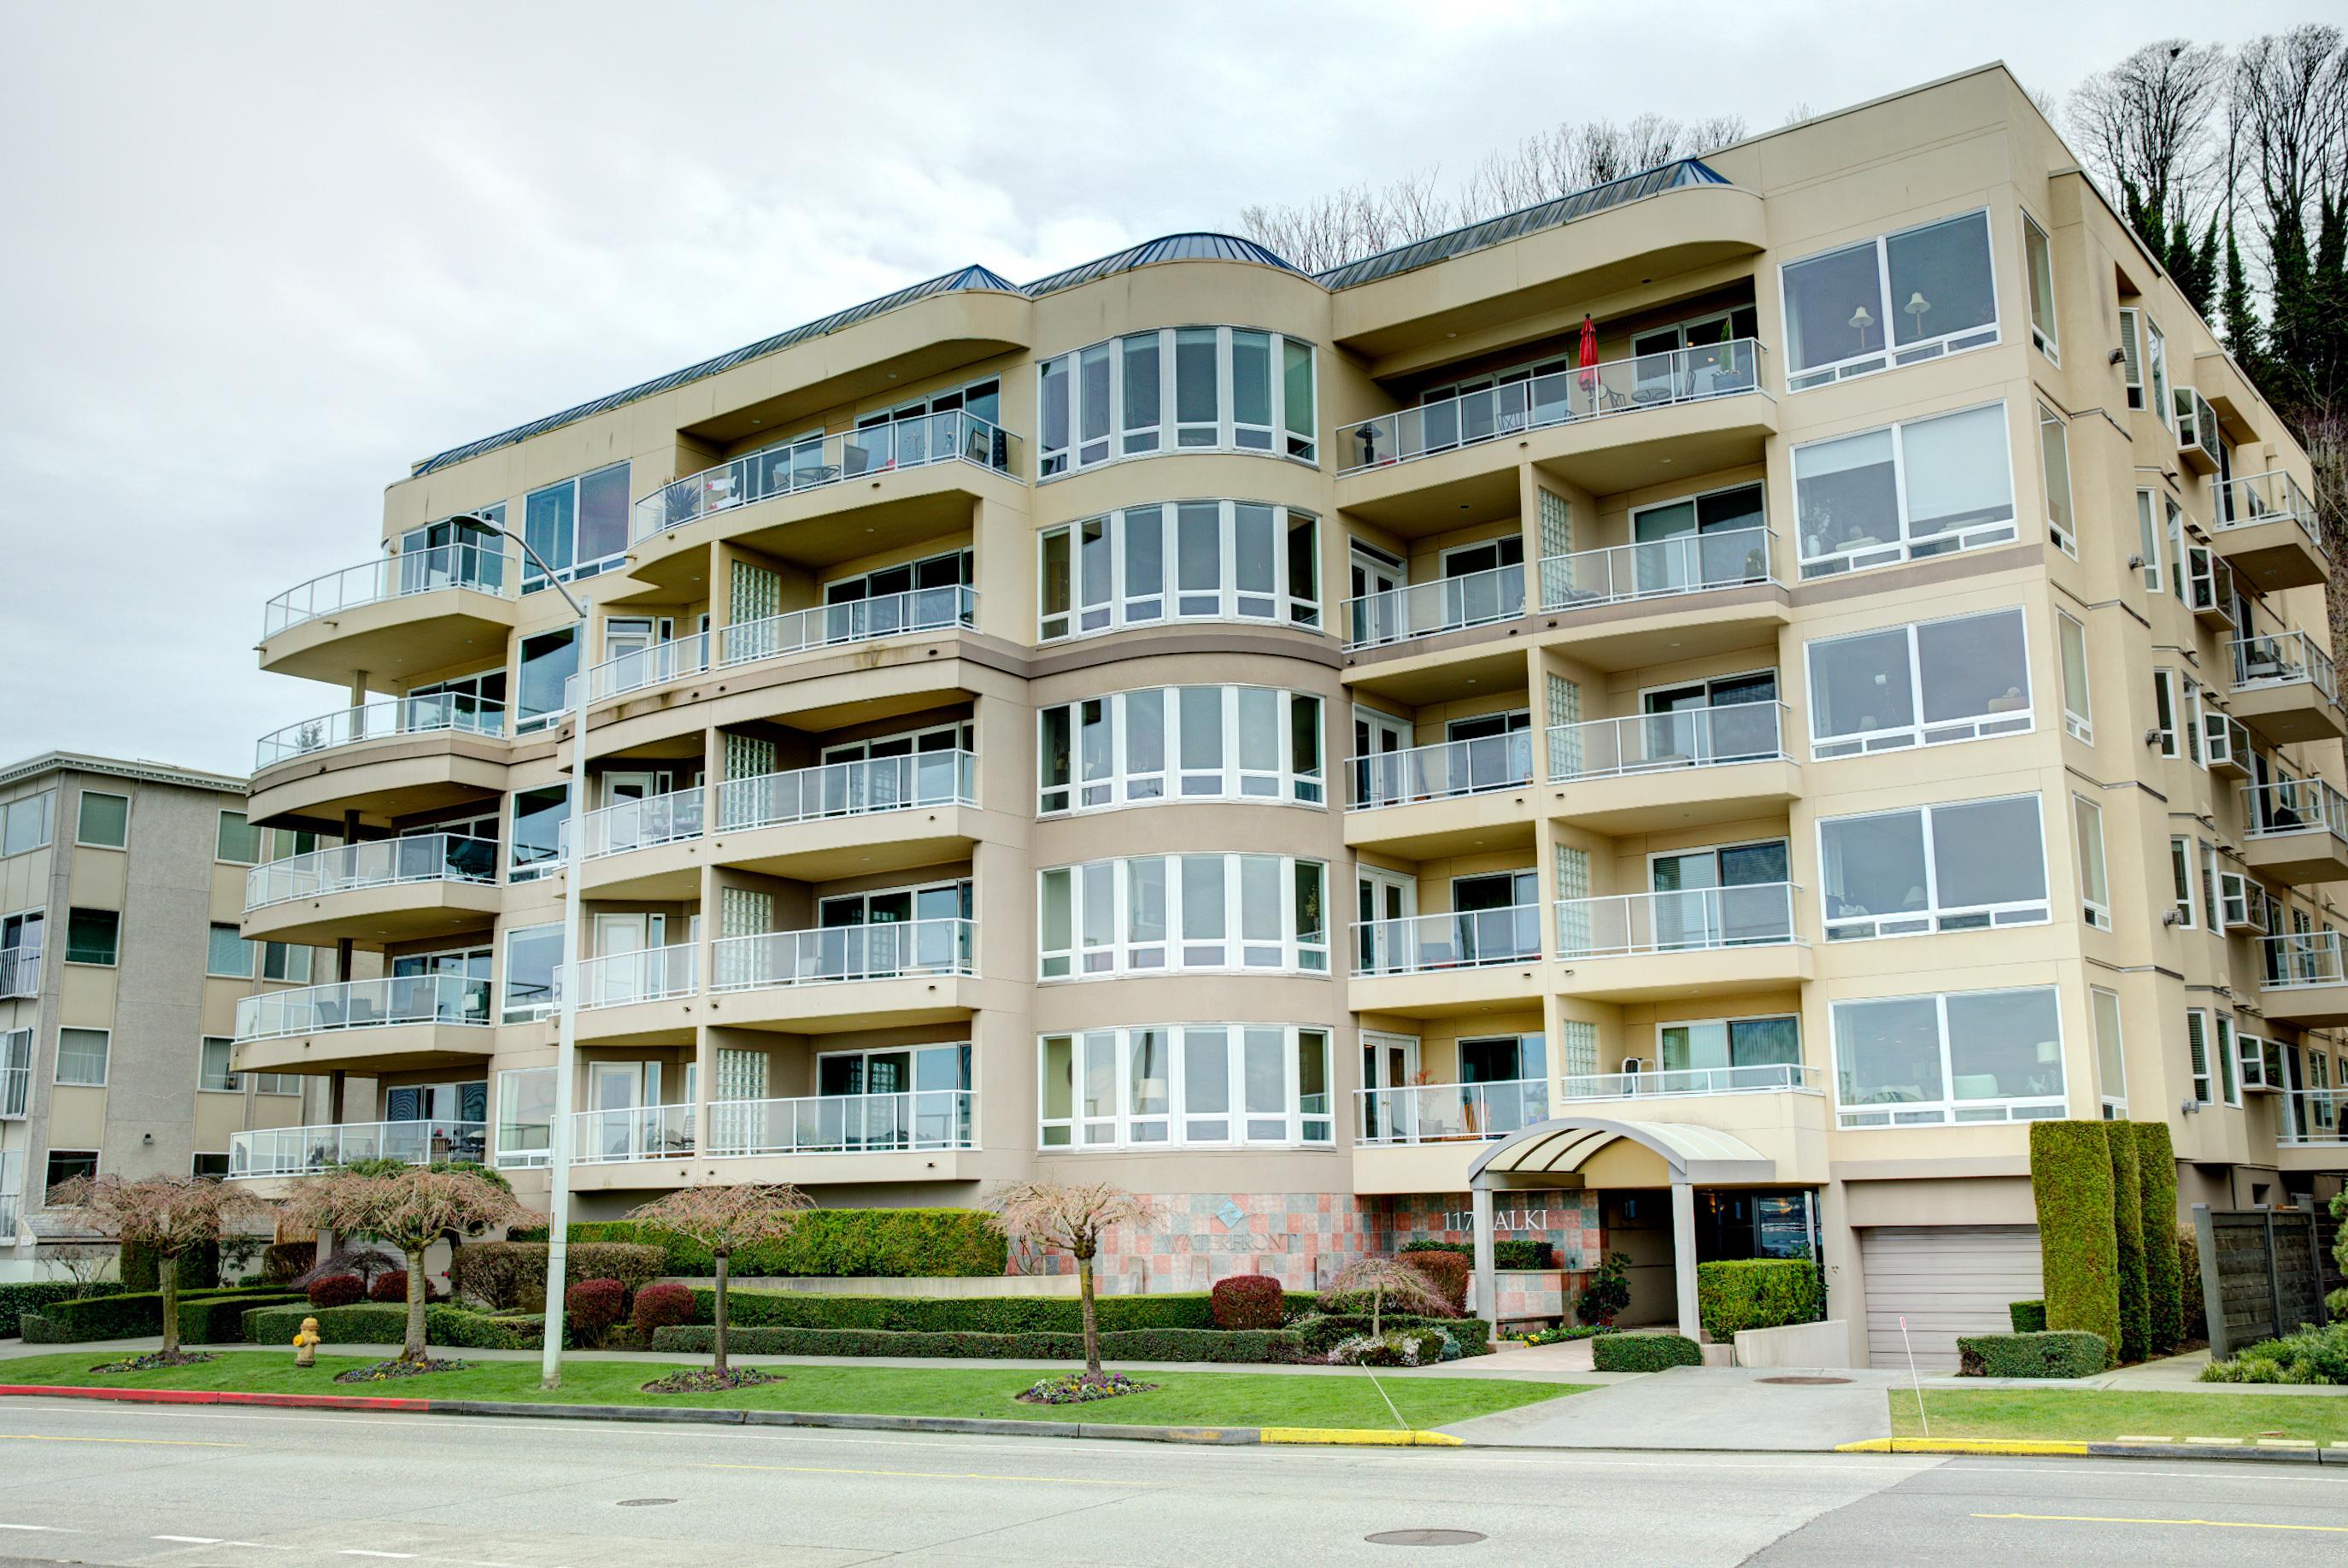 1170 Alki Ave Sw 504, Seattle, WA - USA (photo 1)